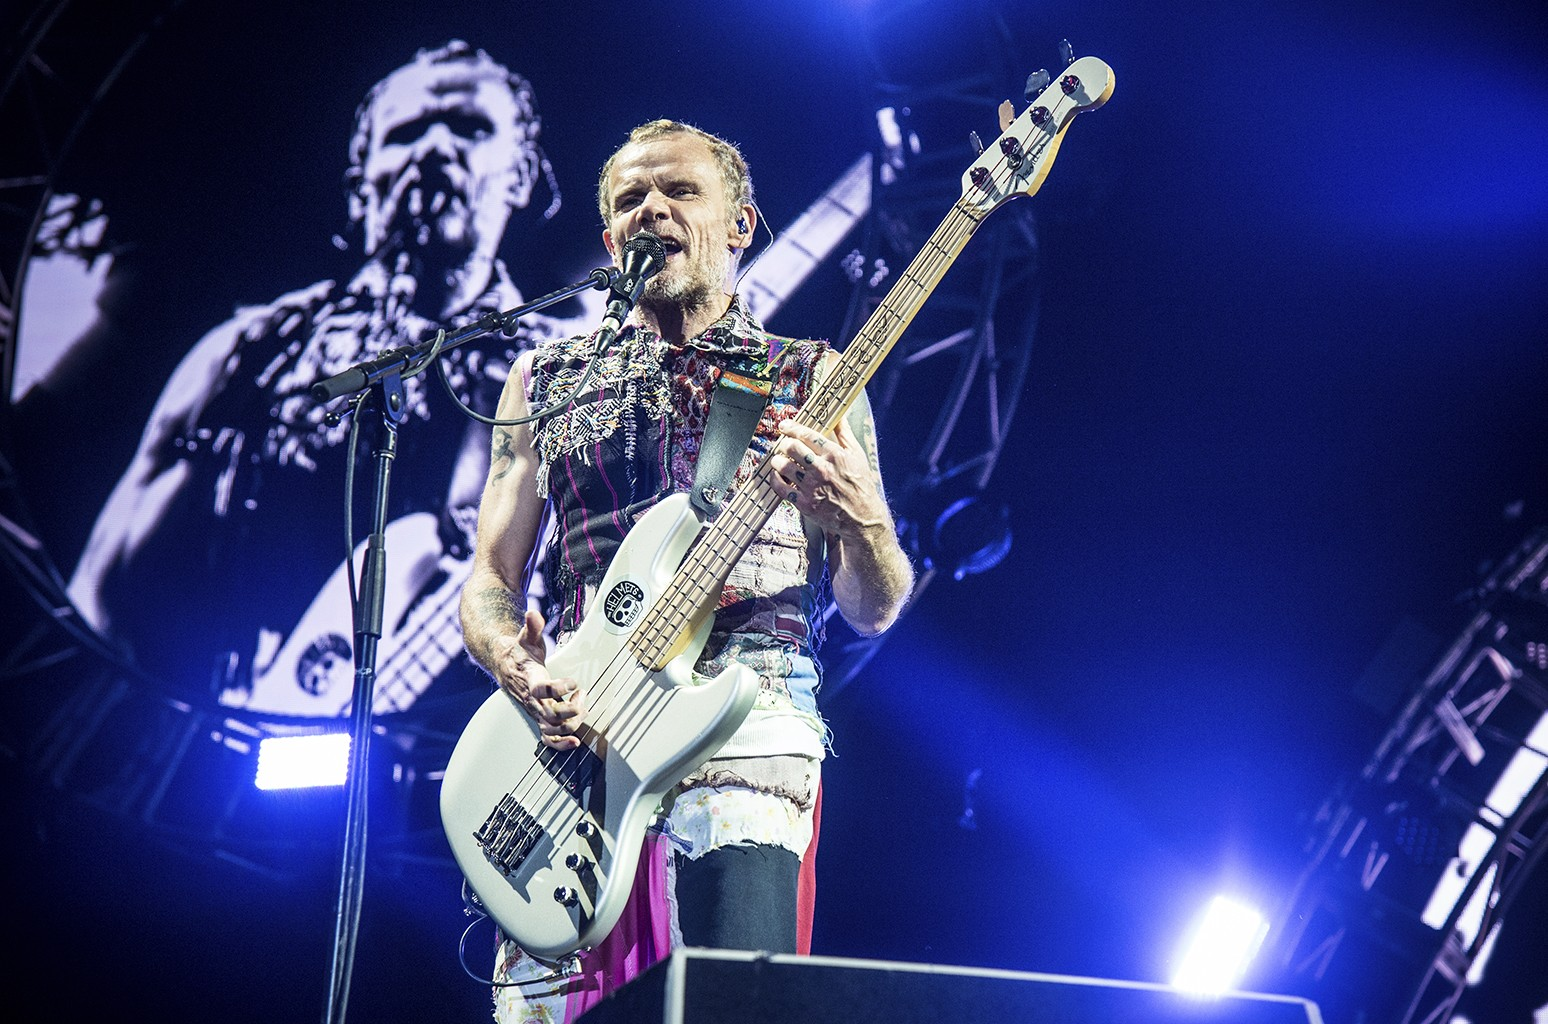 Блоха Red Hot Chili Peppers с любовью к Нанди Бушеллу после невероятной каверы на песню Under the Bridge